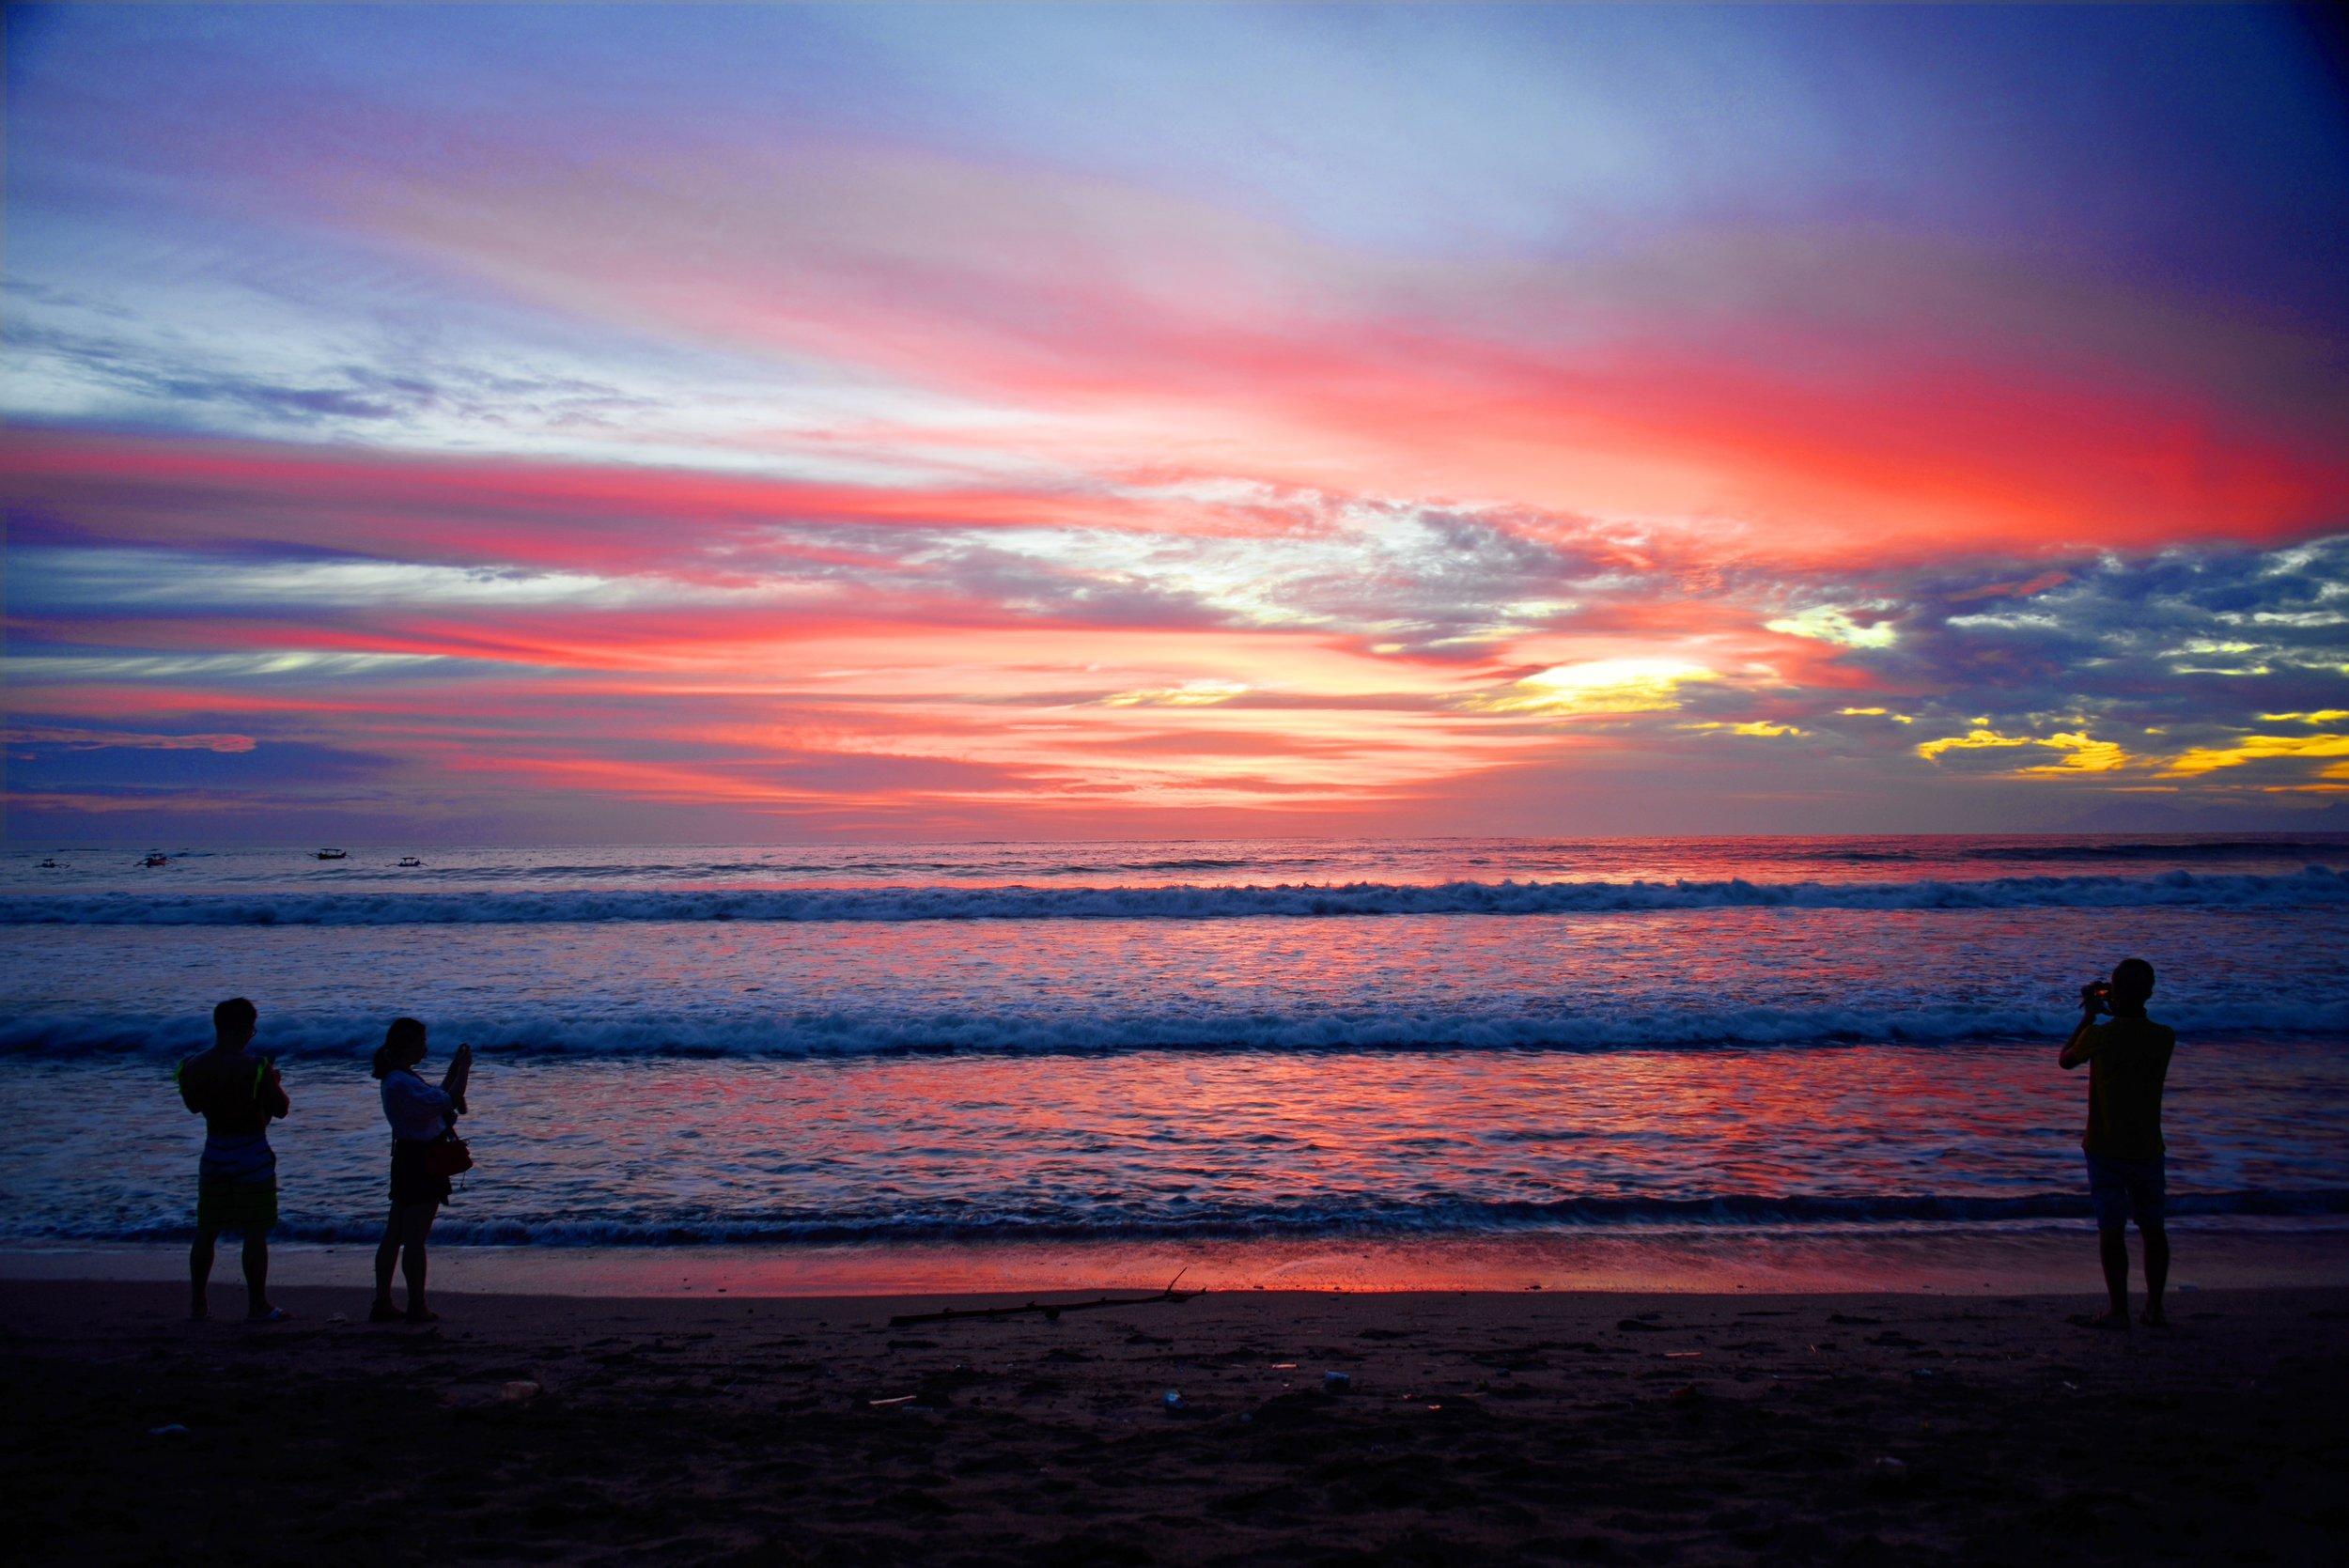 backlit-bali-beach-413958.jpg